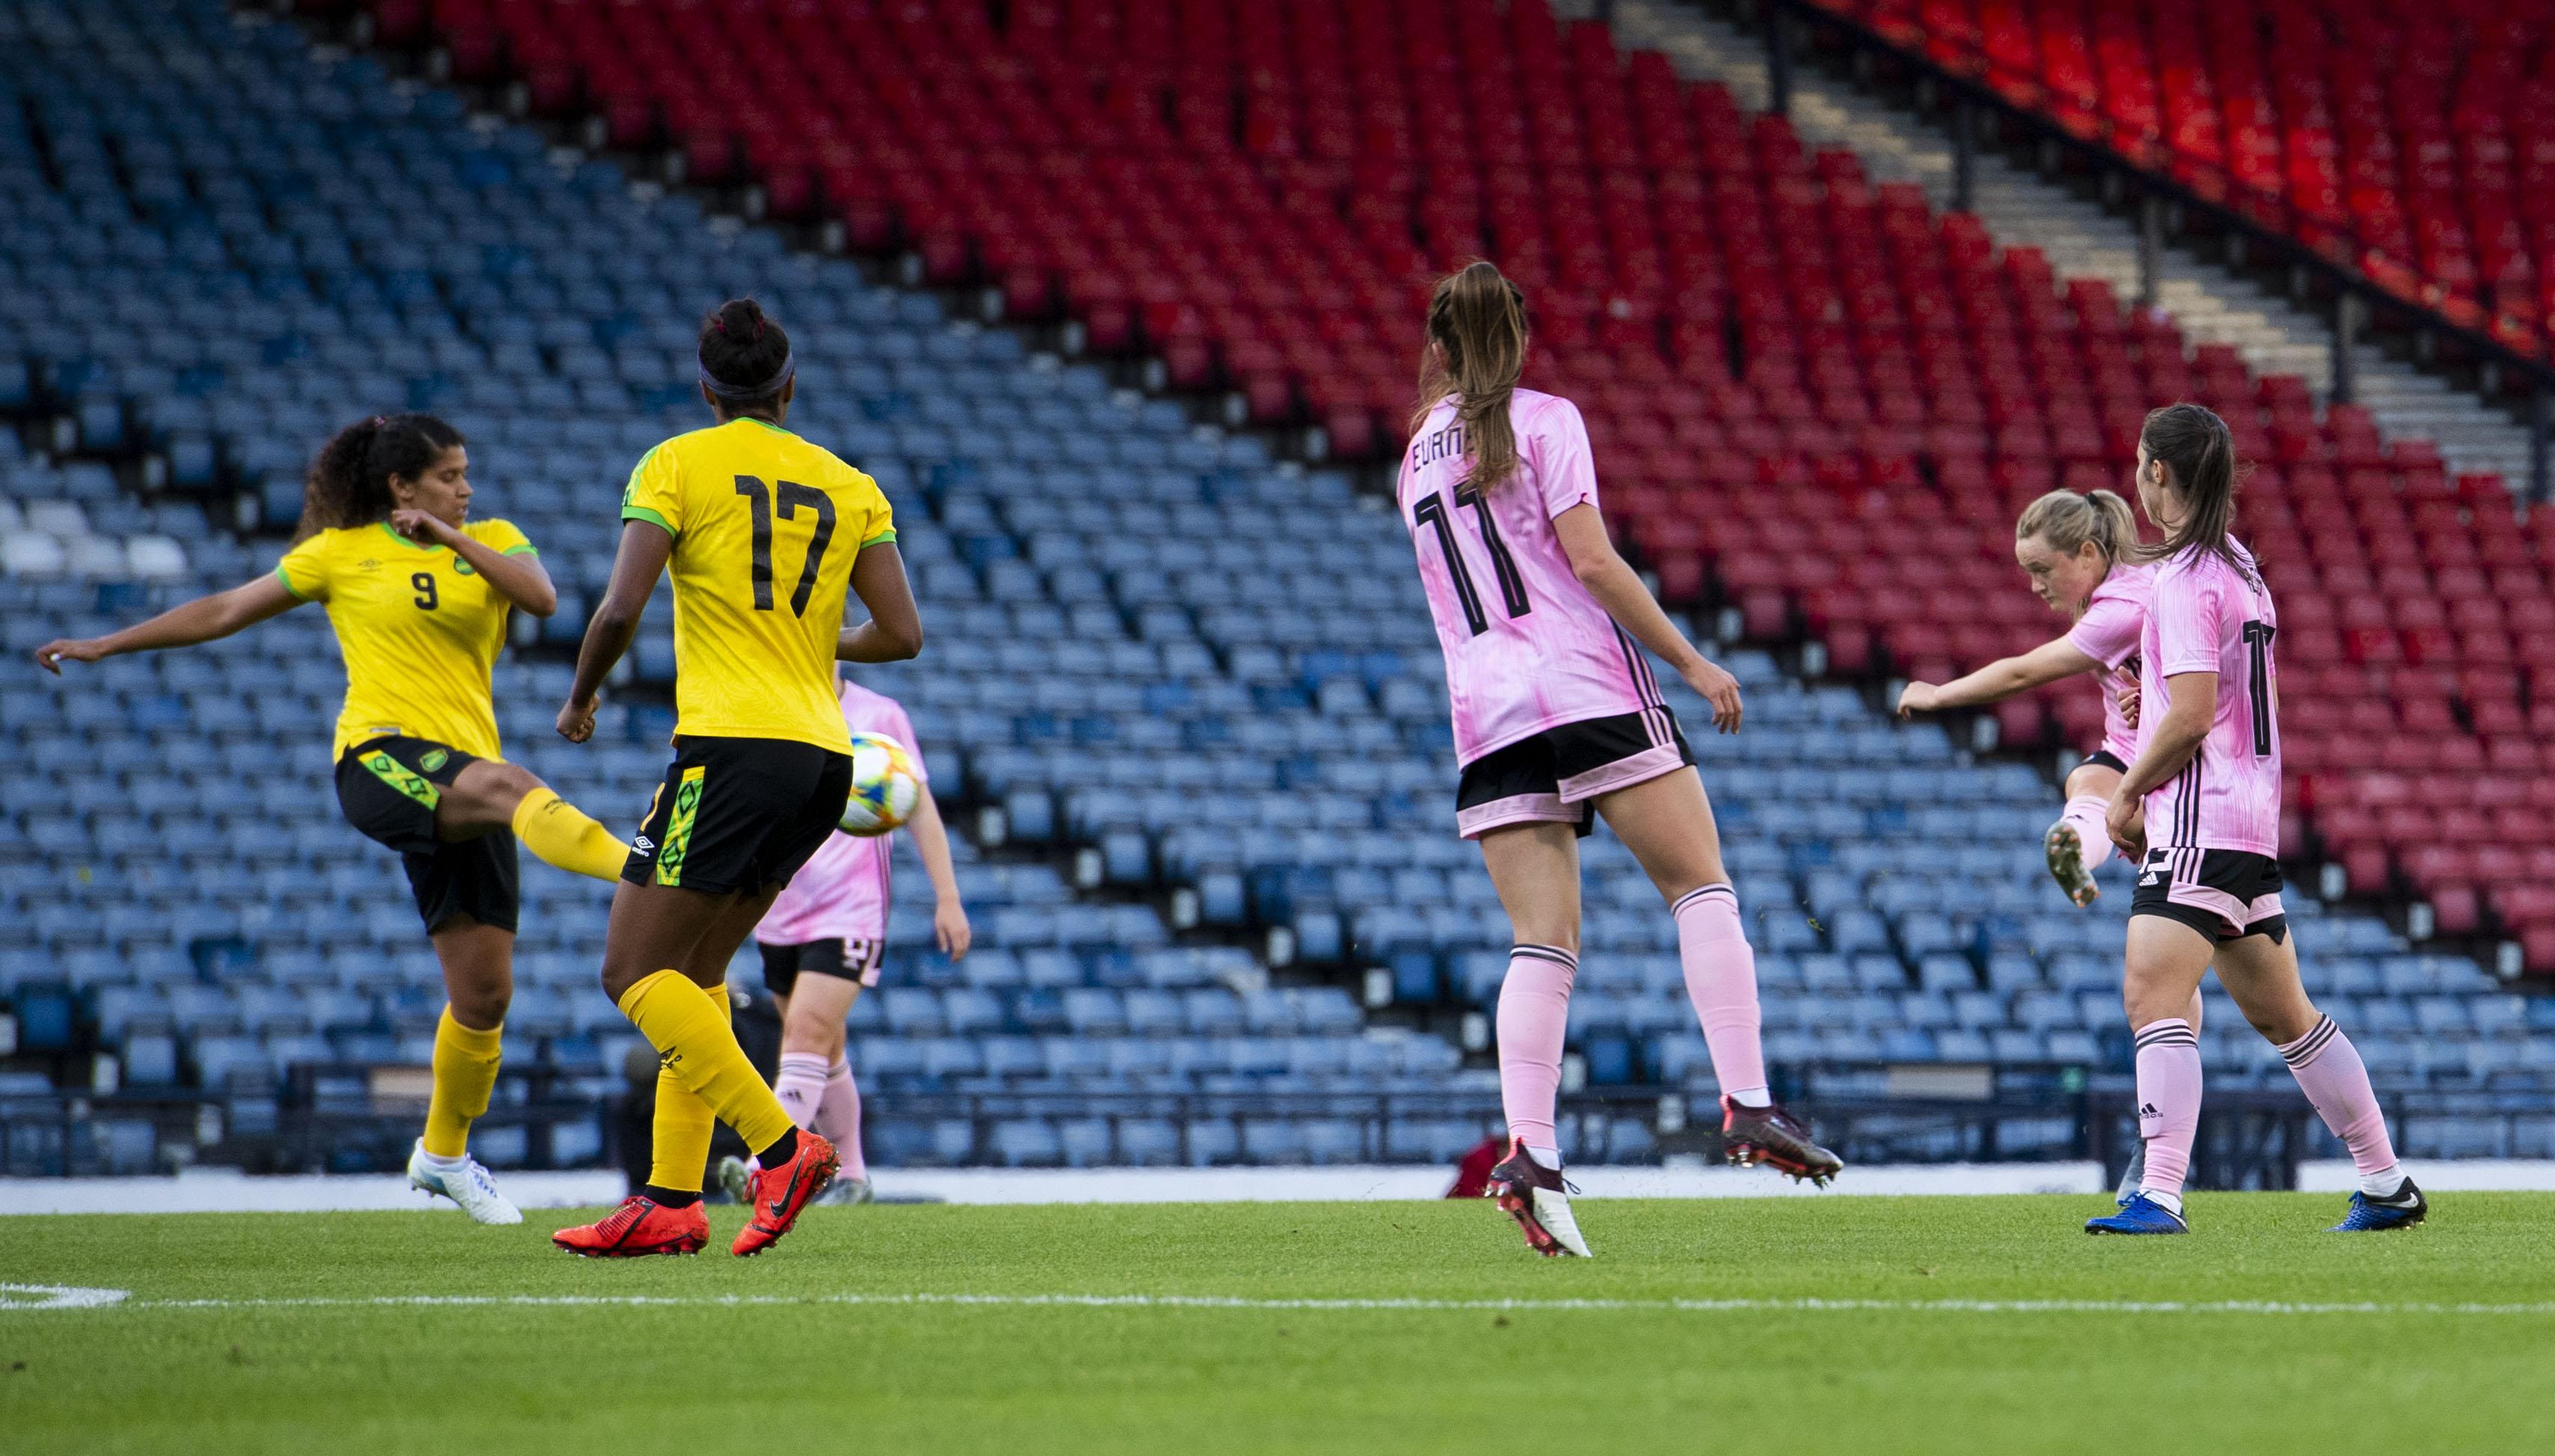 Scotland's Erin Cuthbert scores to make it 1-1